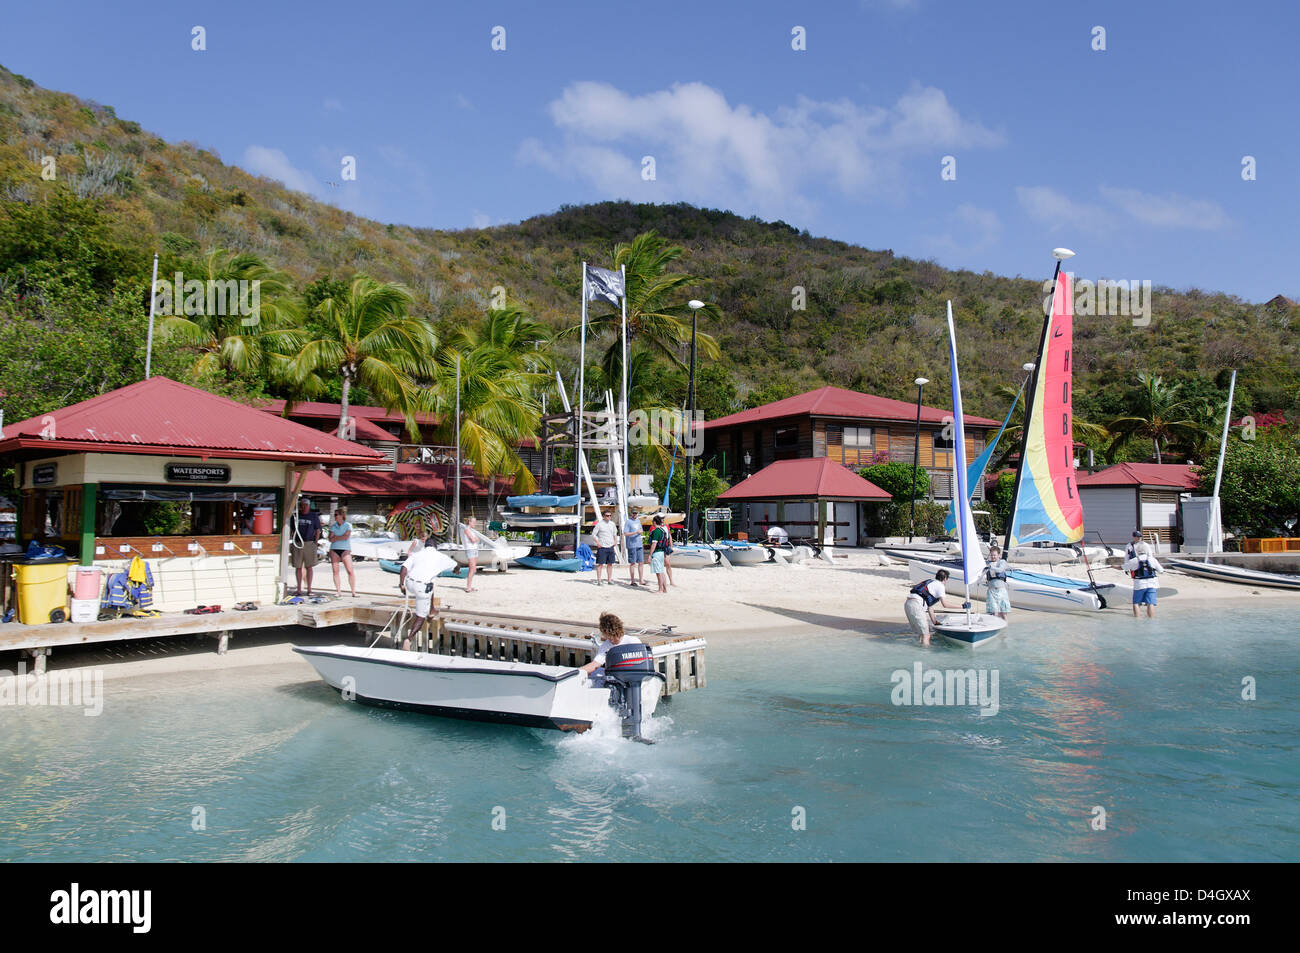 Bitter End Yacht Club, Virgin Gorda Island, British Virgin Islands, West Indies, Caribbean - Stock Image